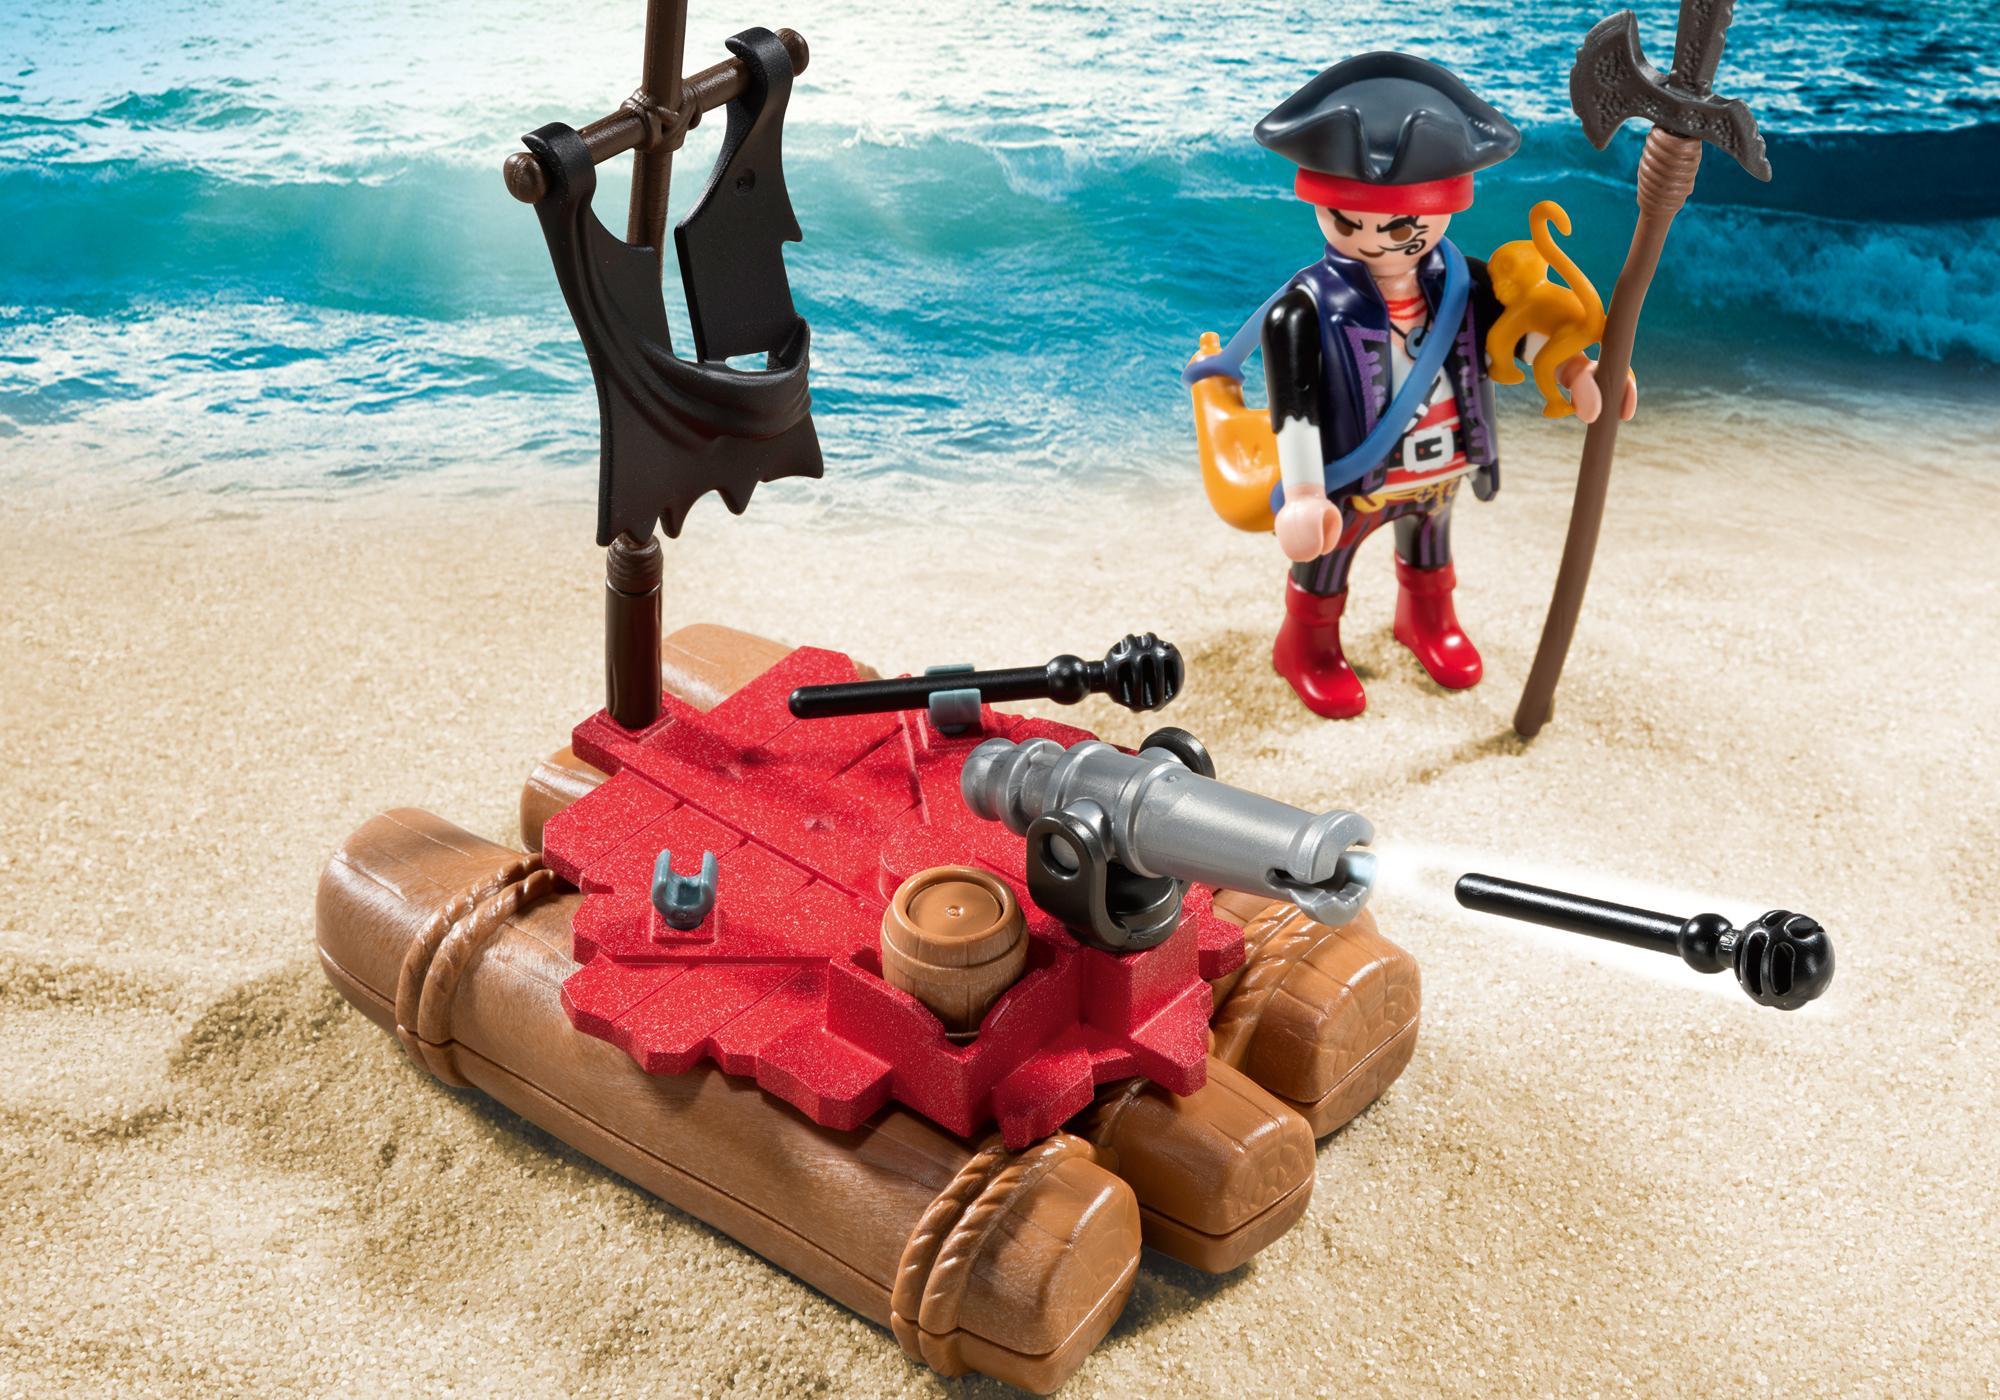 http://media.playmobil.com/i/playmobil/5655_product_extra1/Maleta grande Pirata